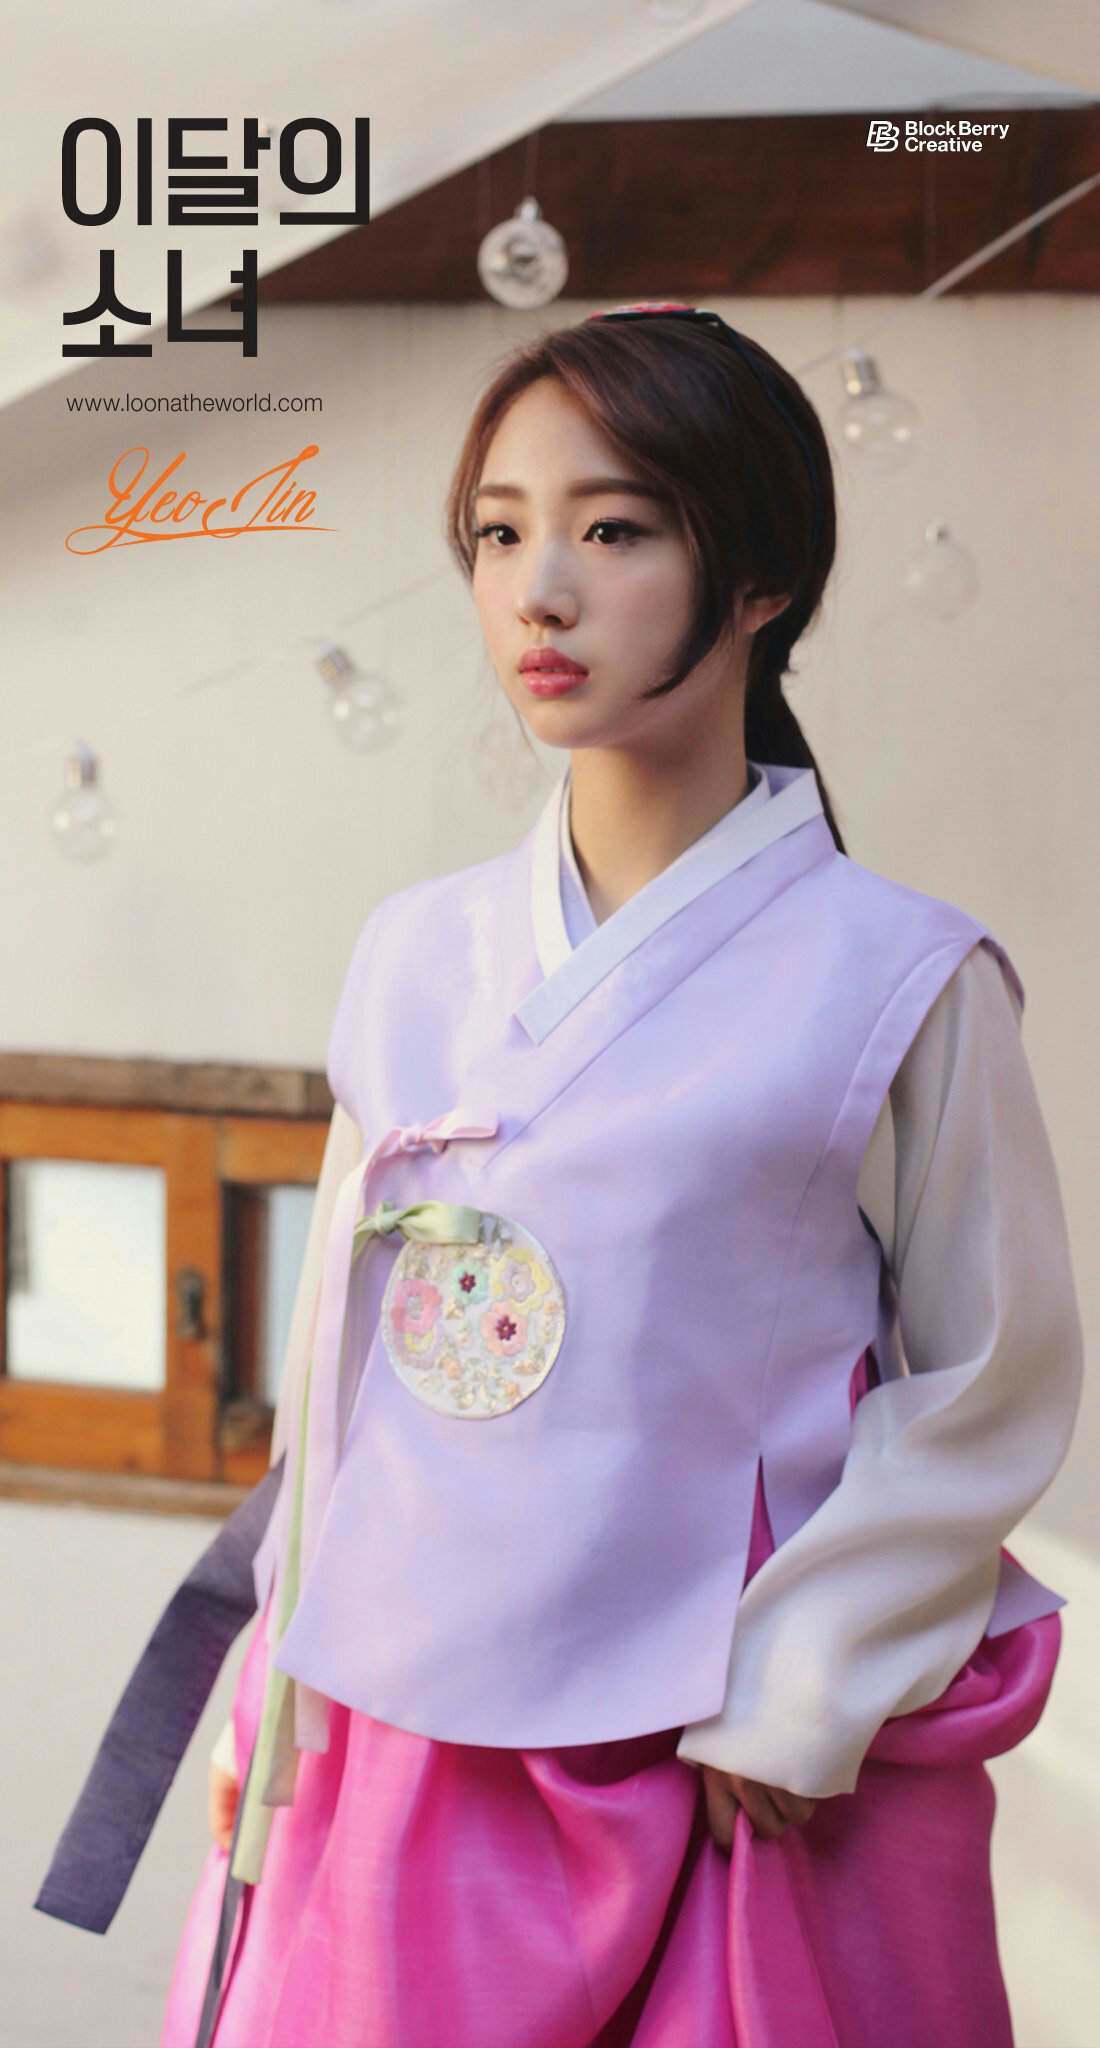 180913 SNS YeoJin Chuseok.png